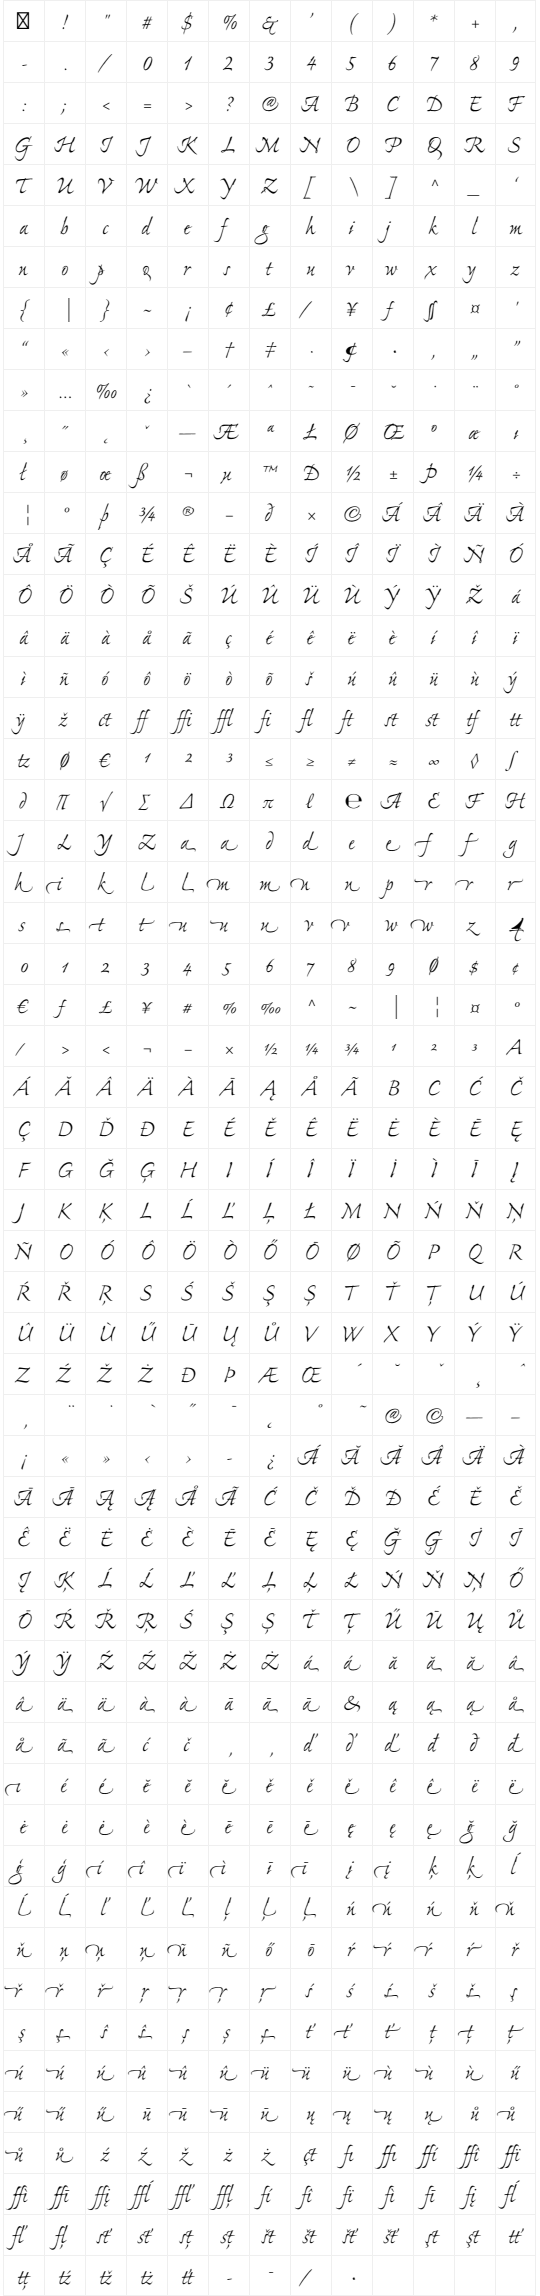 Ex Ponto Pro fonts, $95